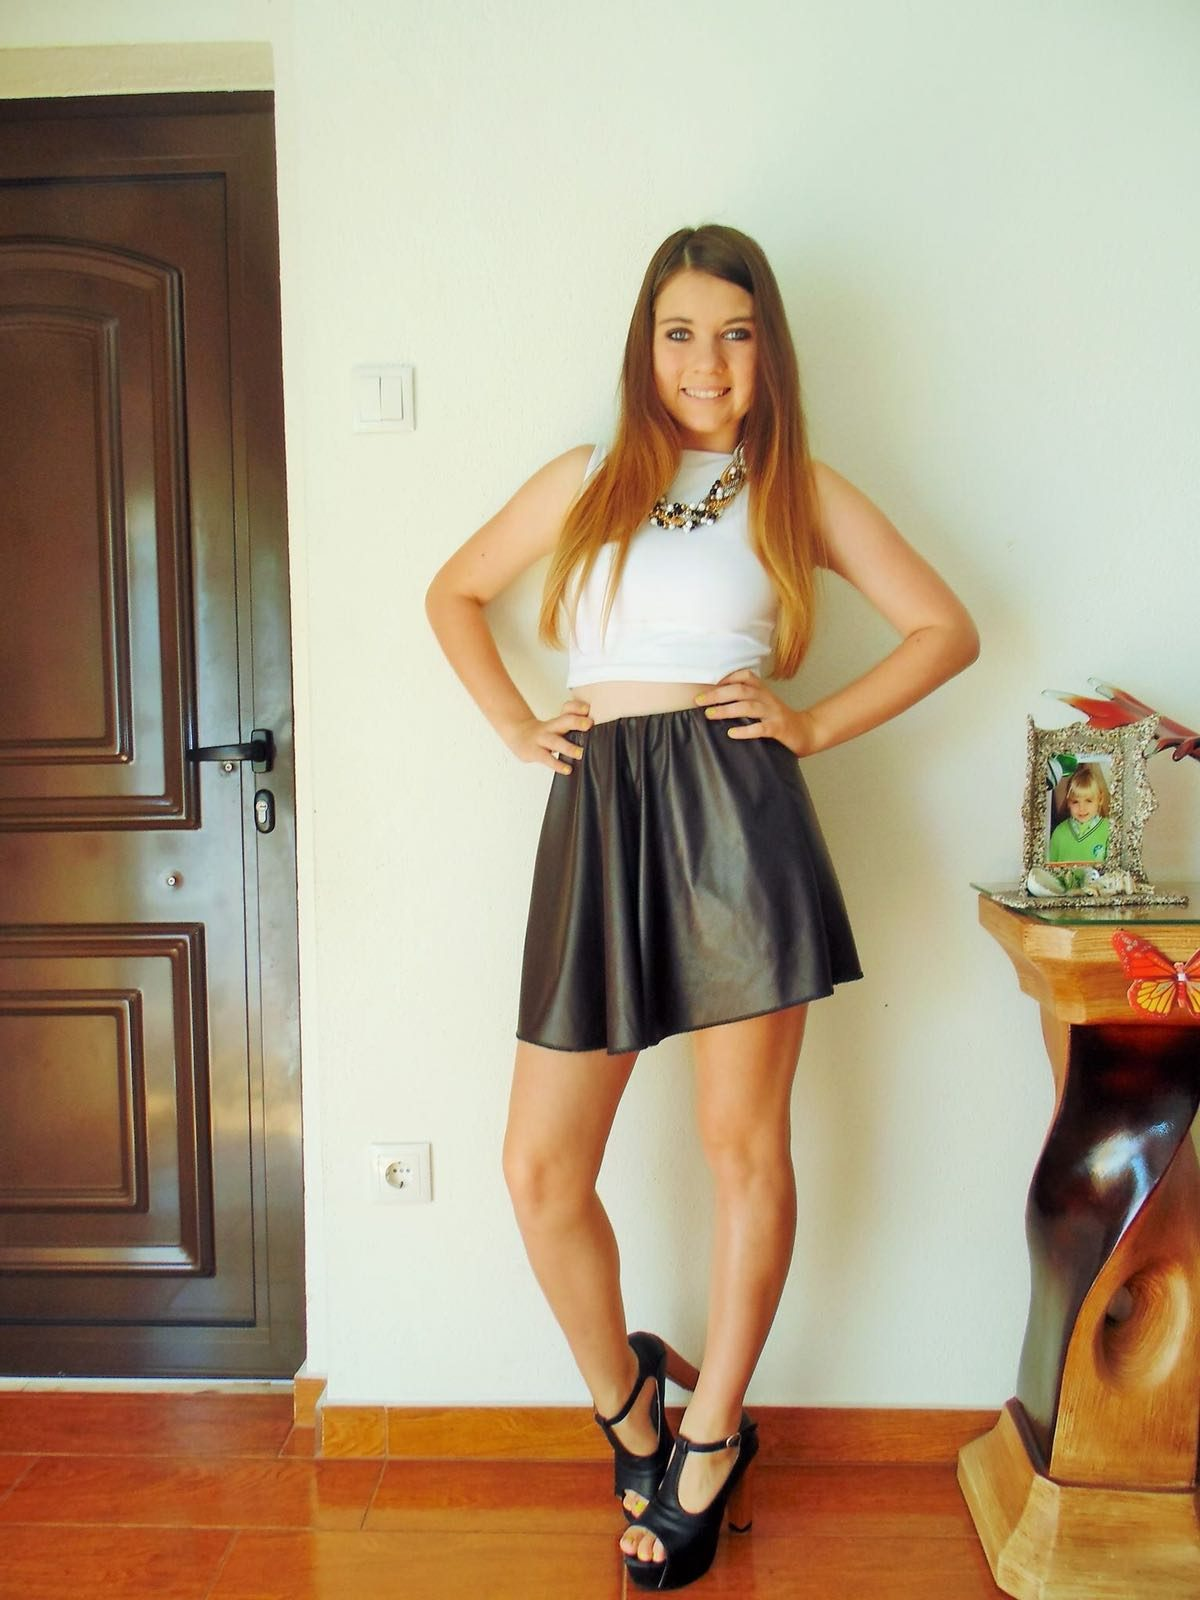 Başakşehir Escort Bayan Seval